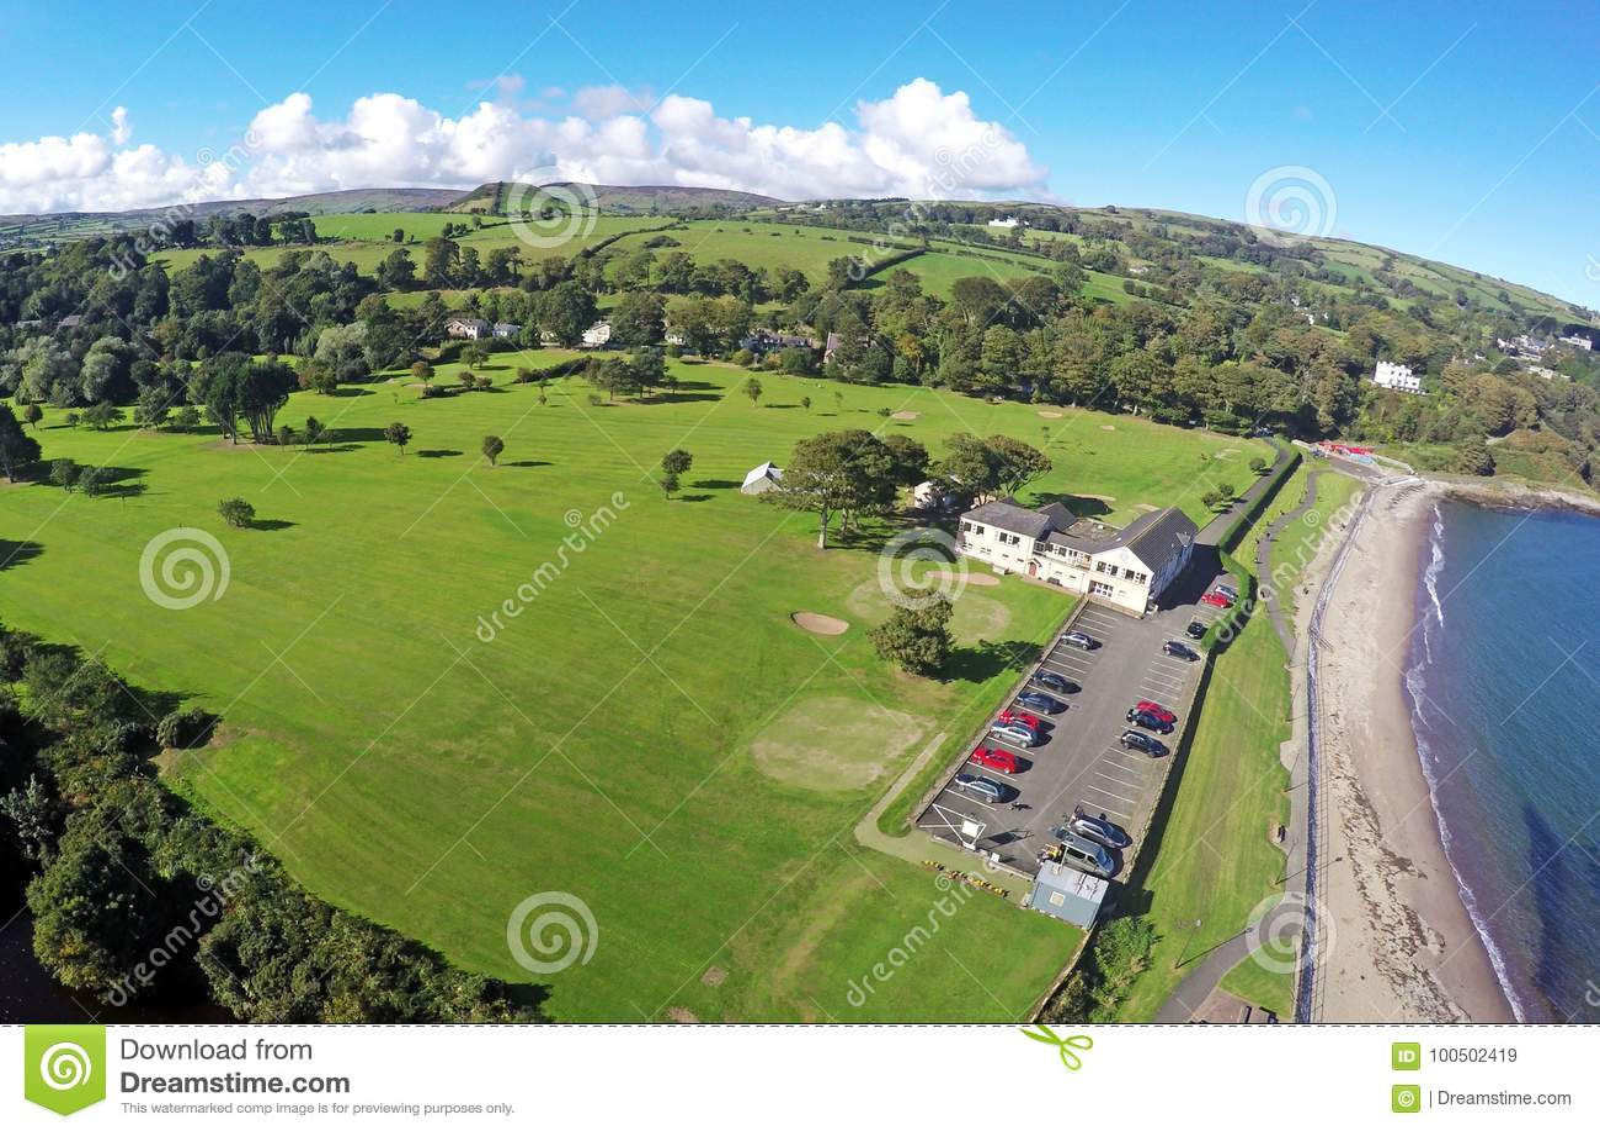 Cushendall Co.Antrim Northern Ireland ireland